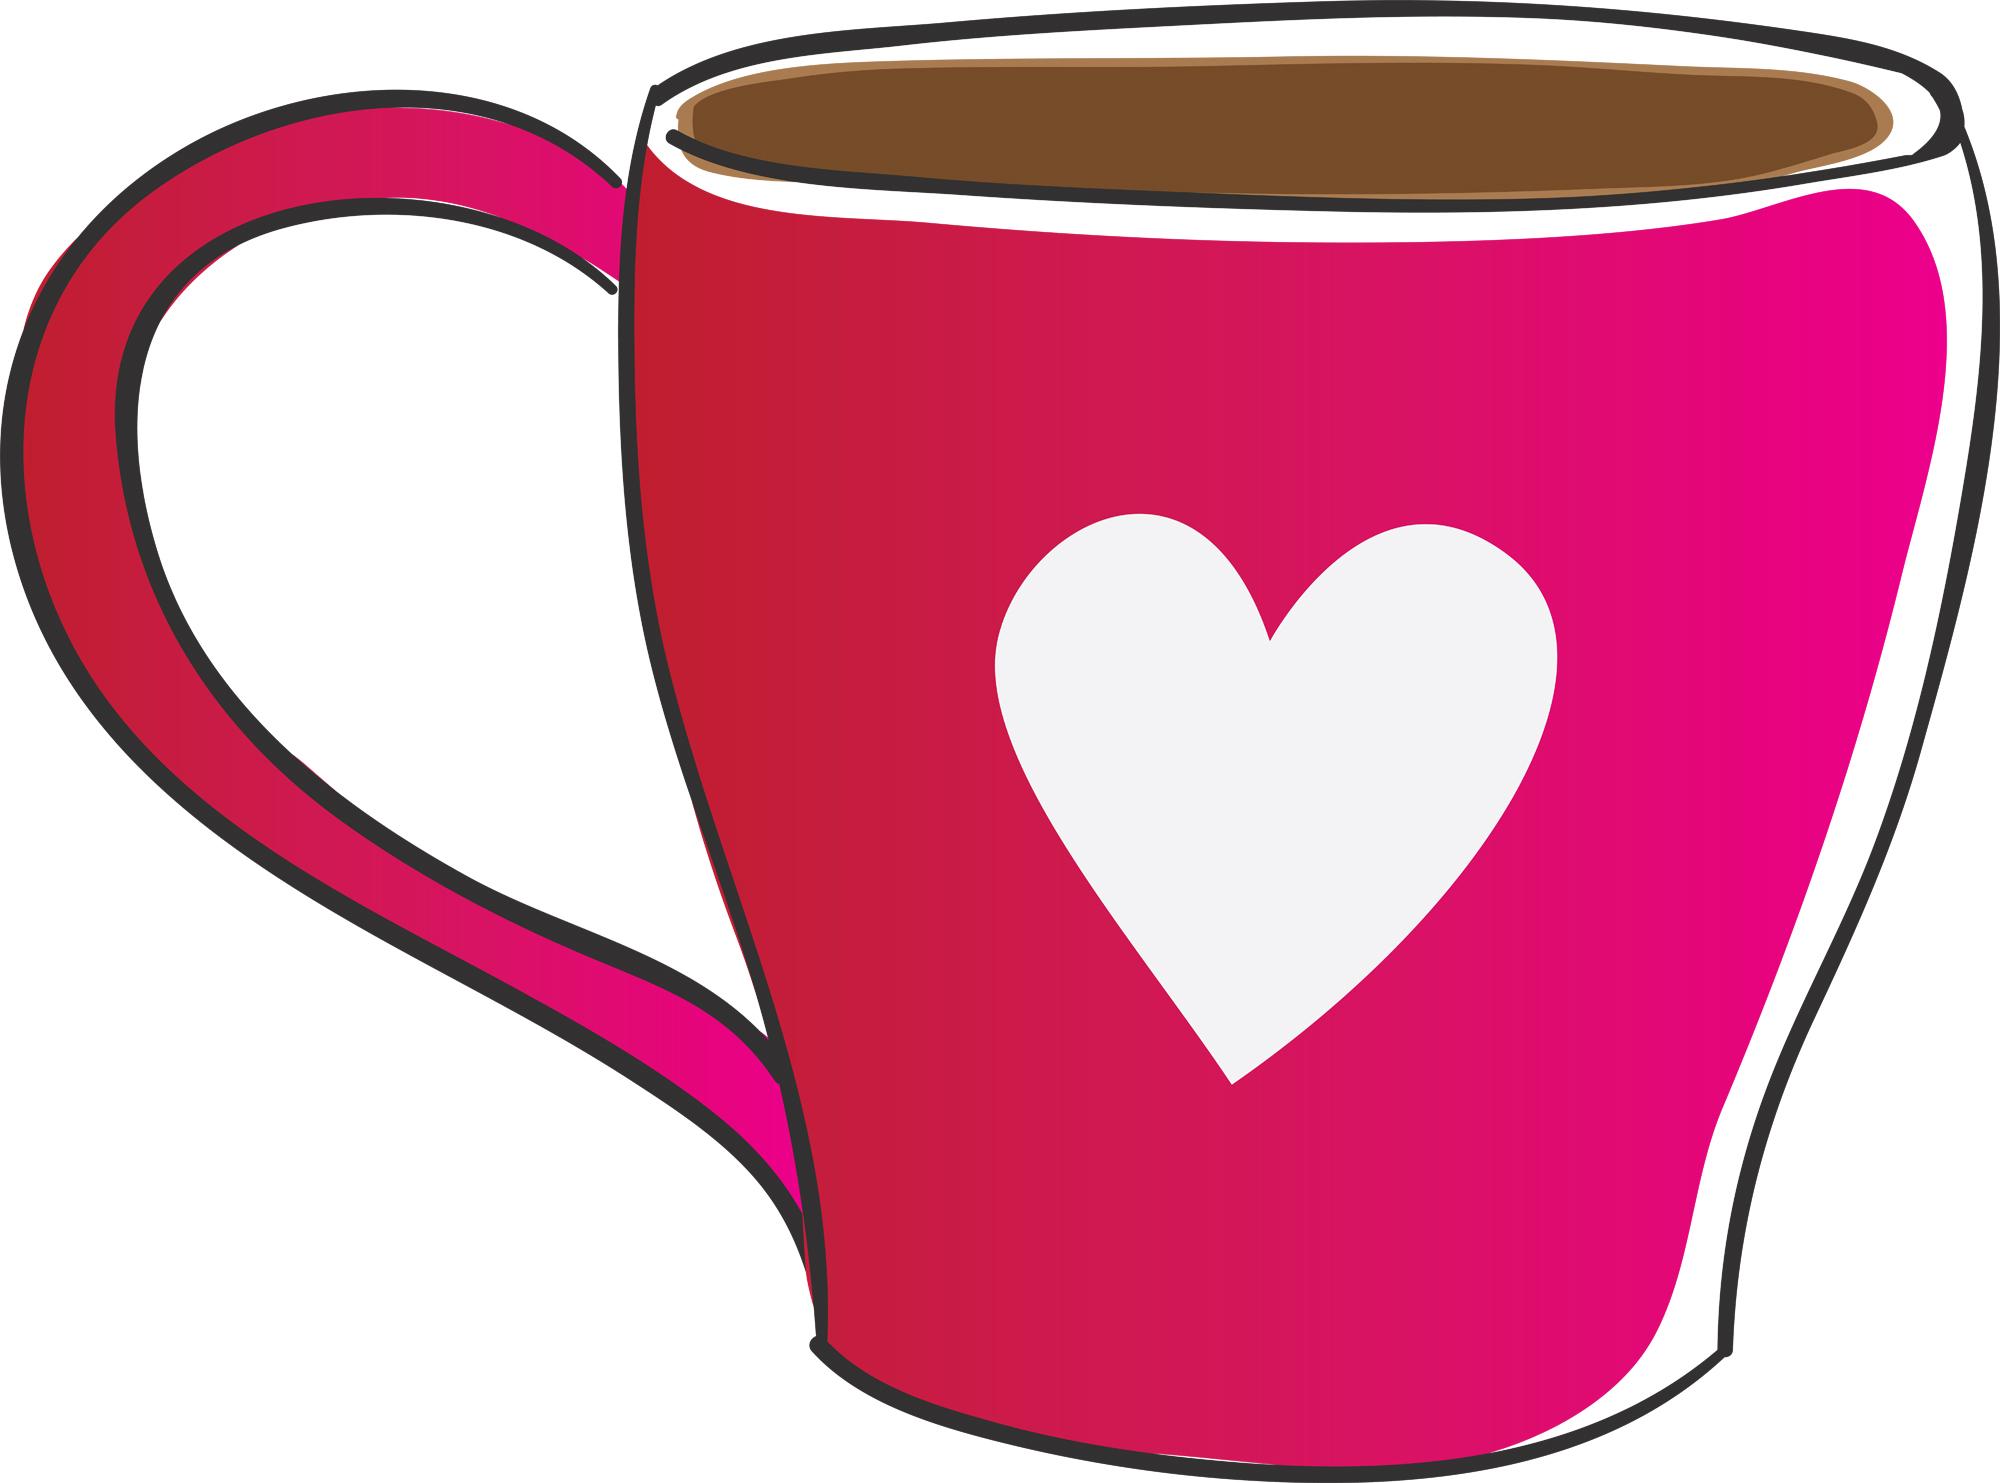 Mug clipart tasa − Prayers My Cup Cupp